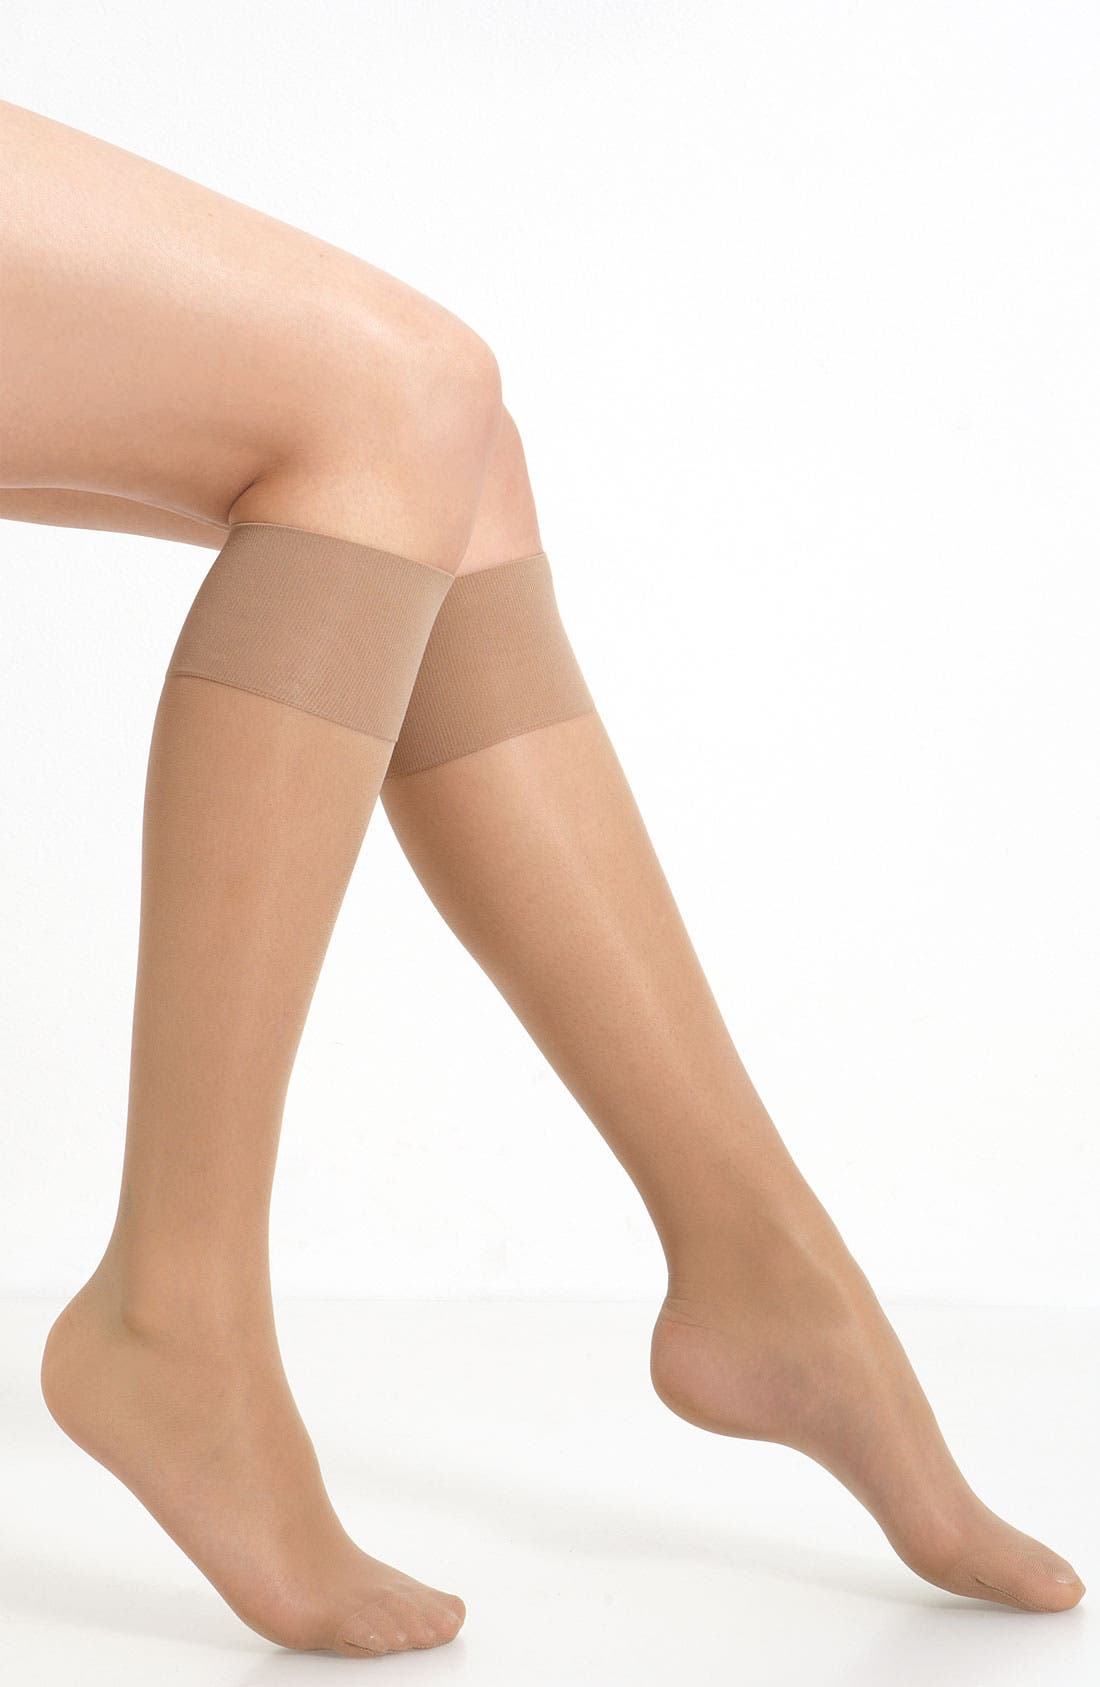 Alternate Image 1 Selected - Oroblu 'Mi-Bas Repos 70' Sheer Support Knee Highs